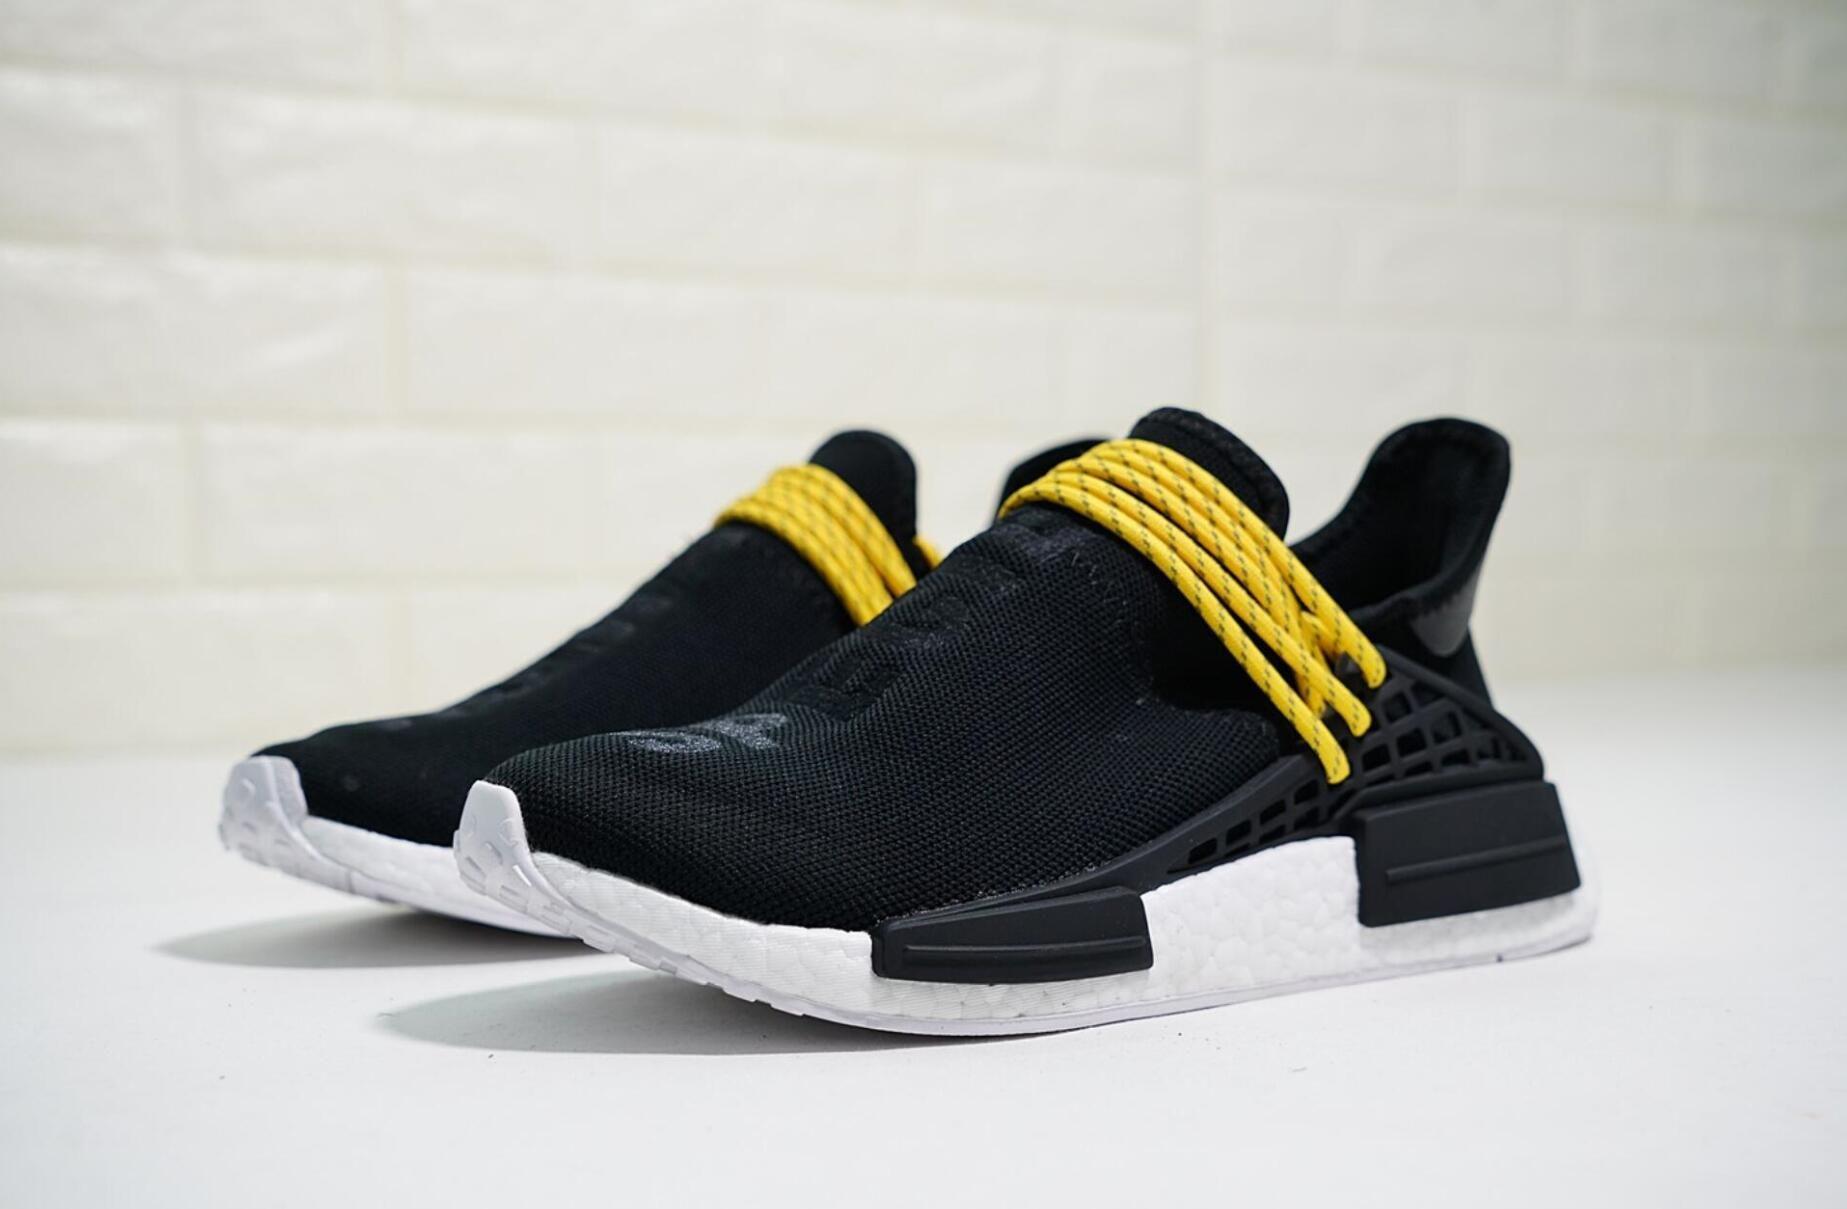 newest a343a a71ca Cheap Human Race Hu Holi casual Shoes Oreo Nobel ink Black Nerd Designer  Men Women Sport Shoes Sneakers 36-46